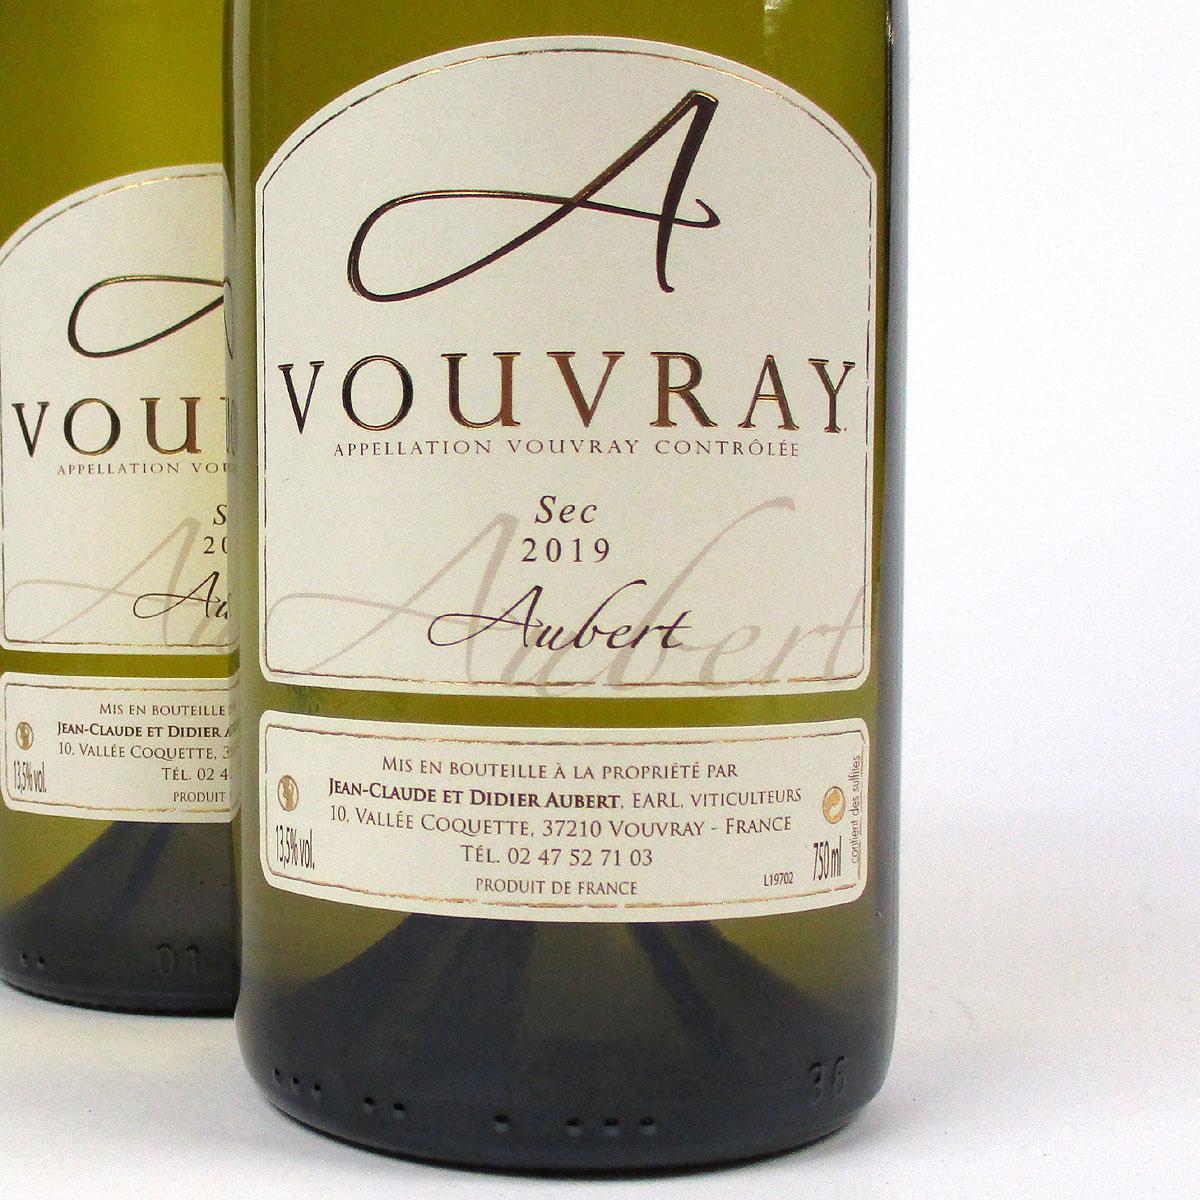 Vouvray: Jean-Claude & Didier Aubert Sec 2019